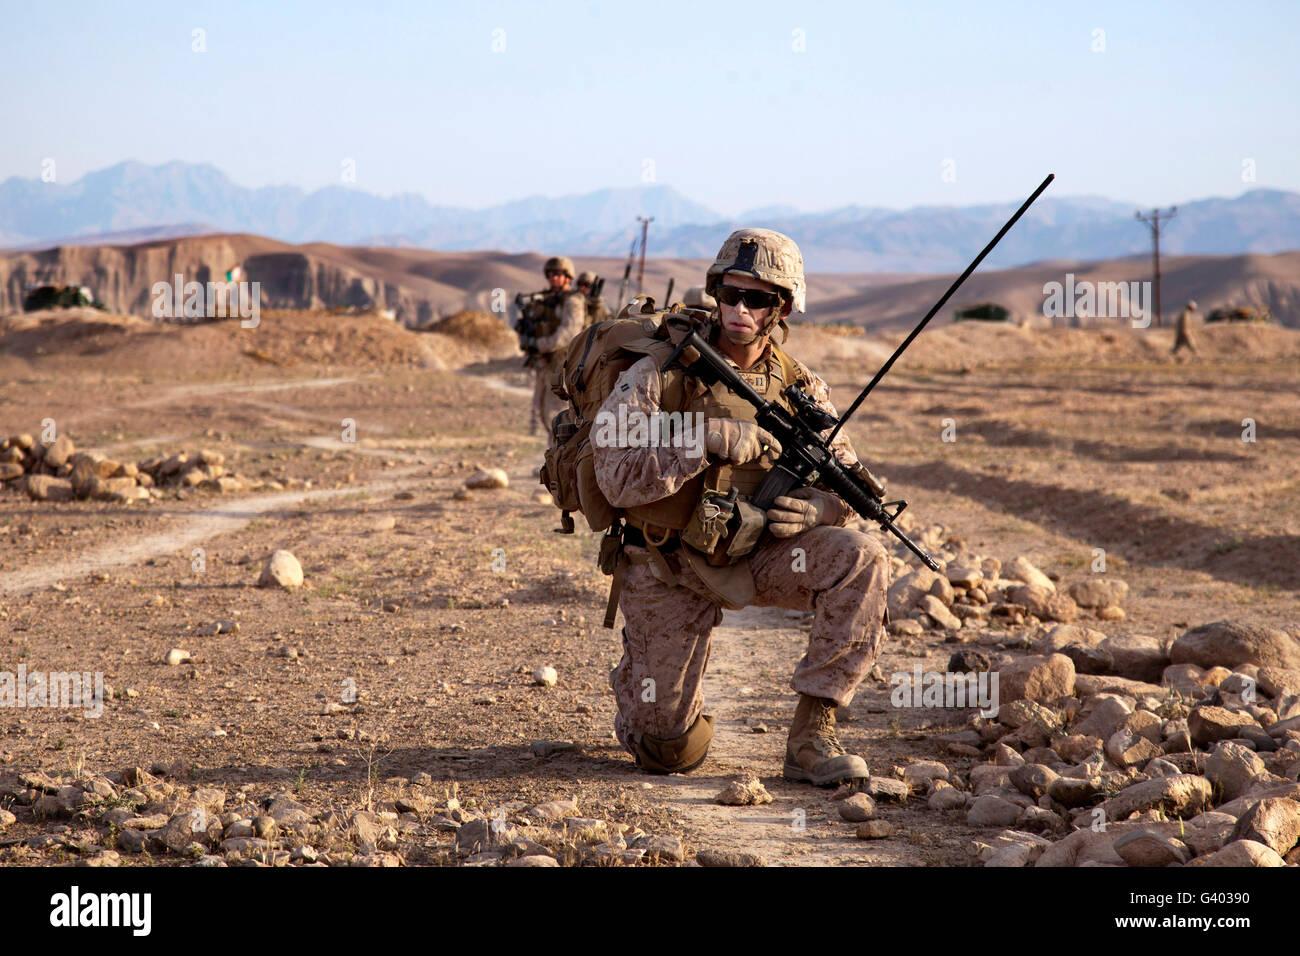 U.S. Marine pauses during a dismounted patrol. - Stock Image